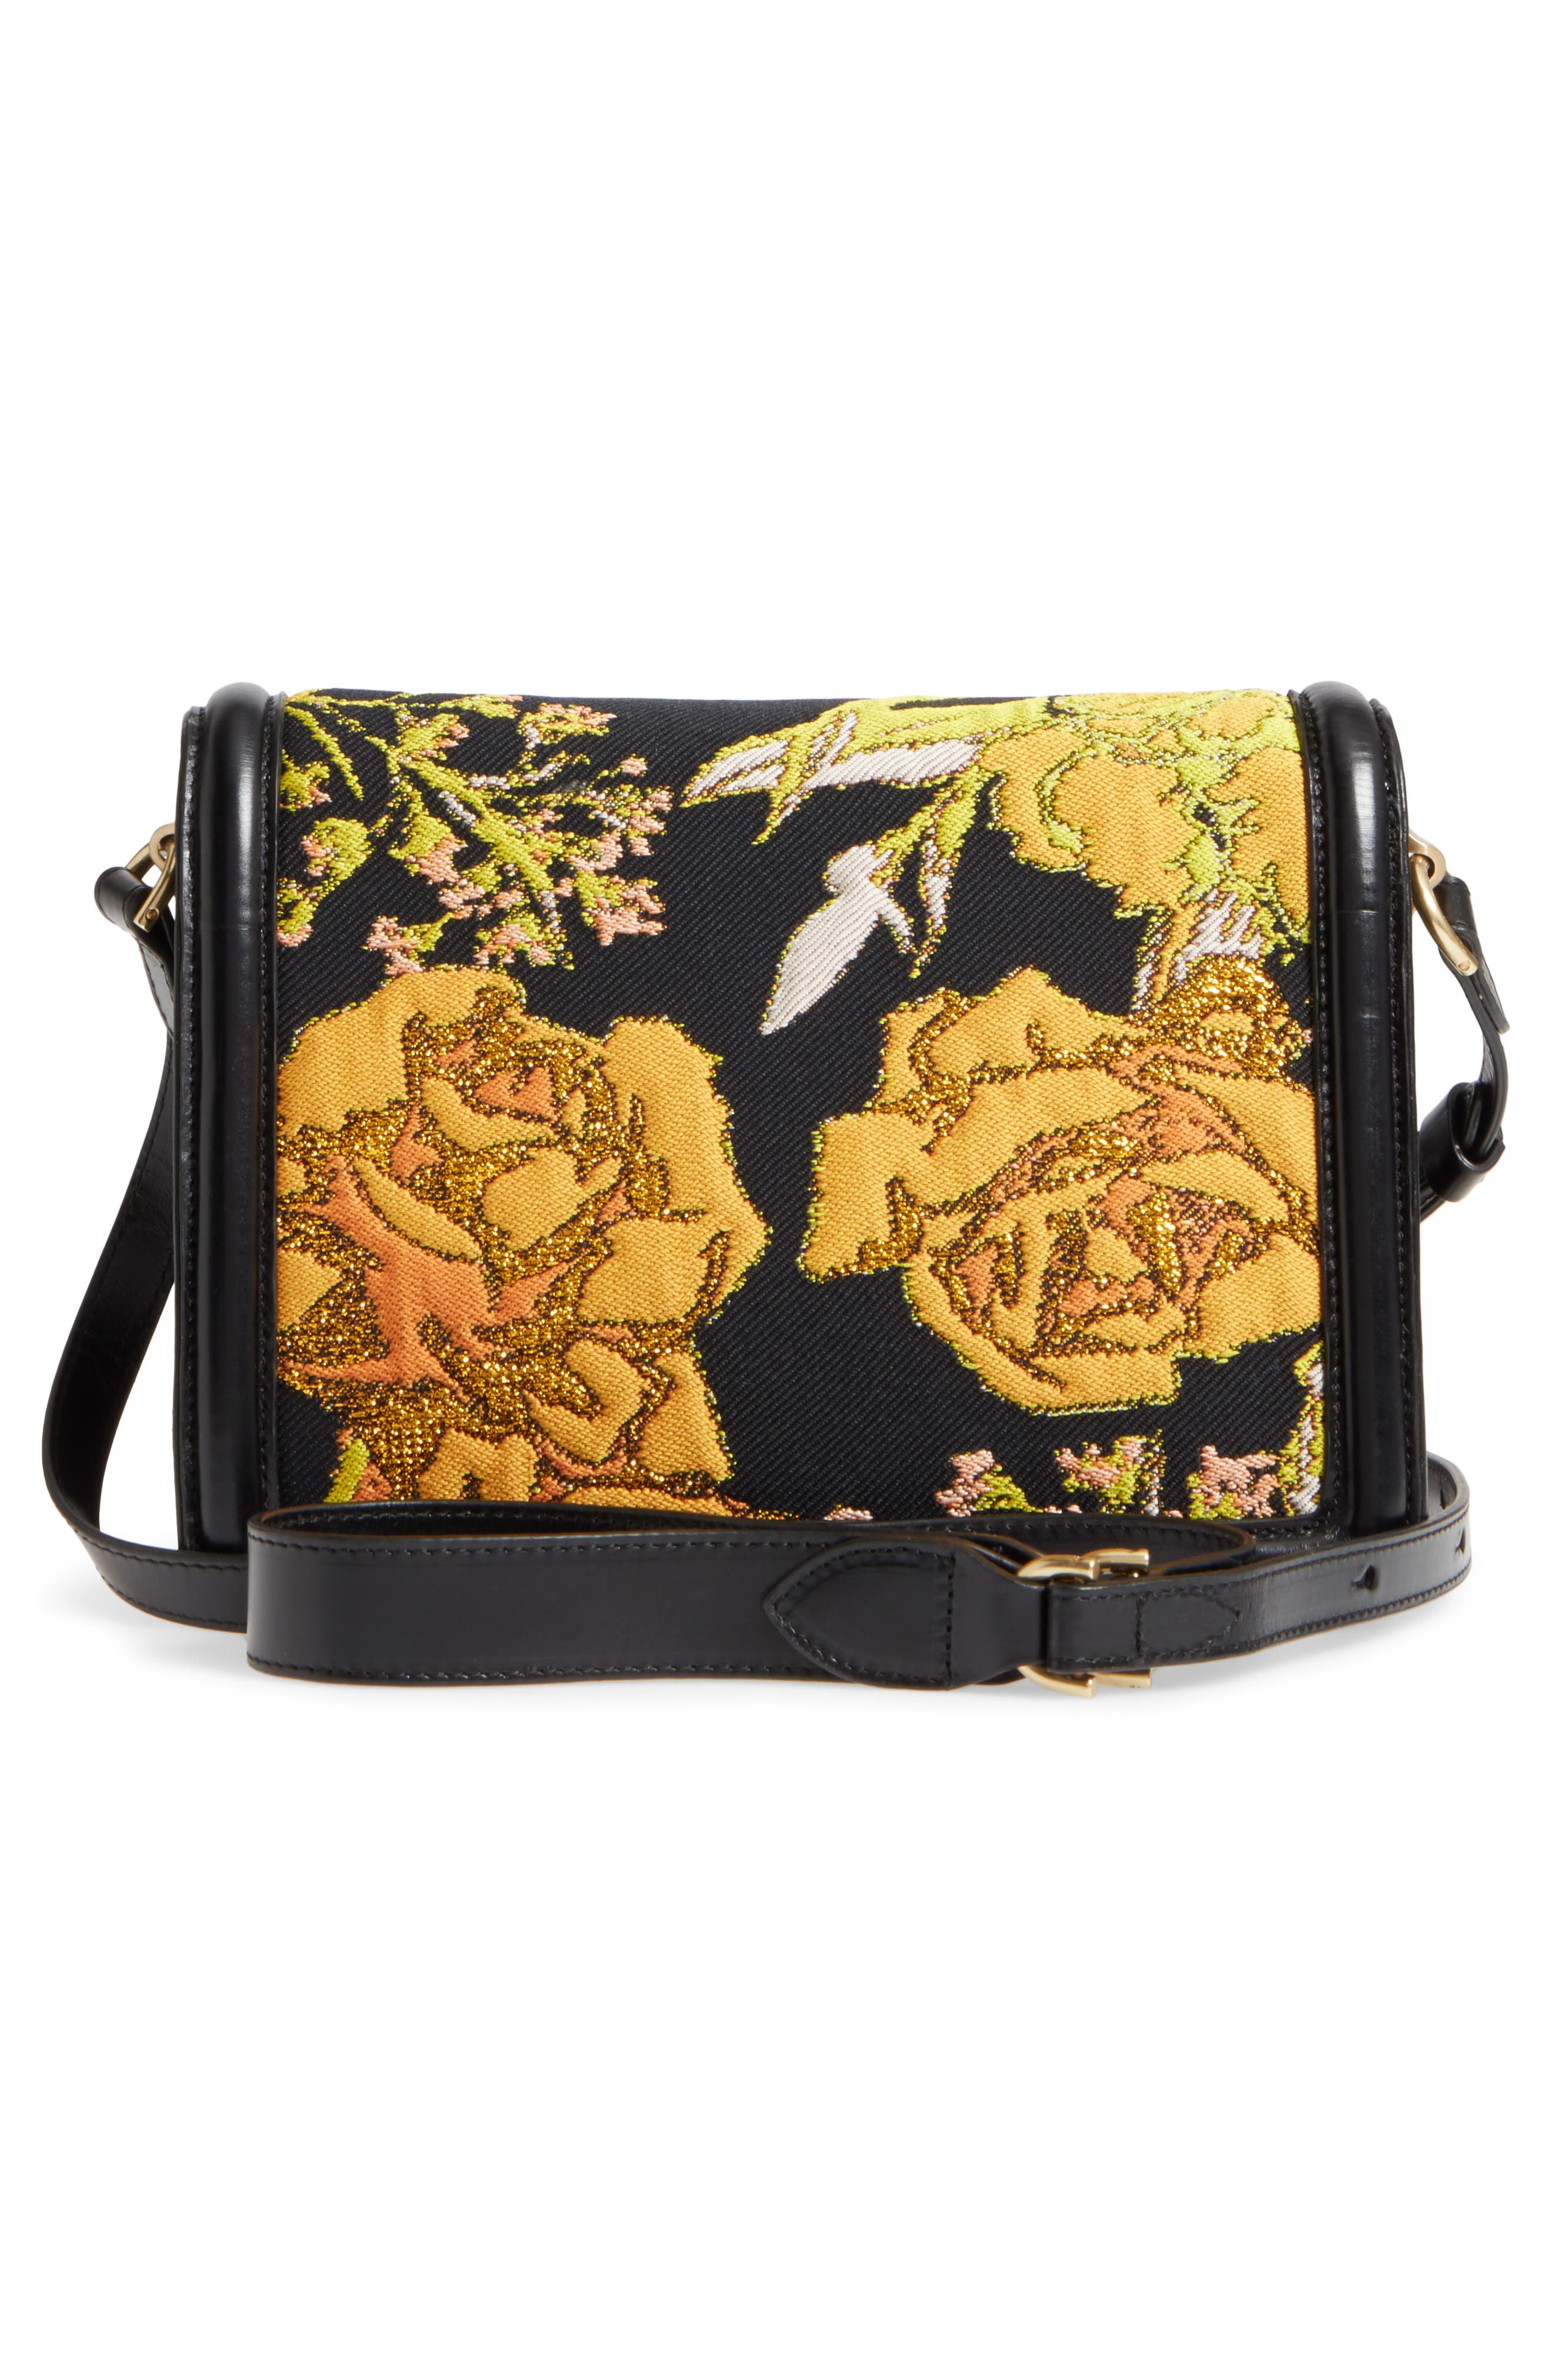 DRIES VAN NOTEN,                             Floral Jacquard & Leather Crossbody Bag,                             Alternate thumbnail 3, color,                             700